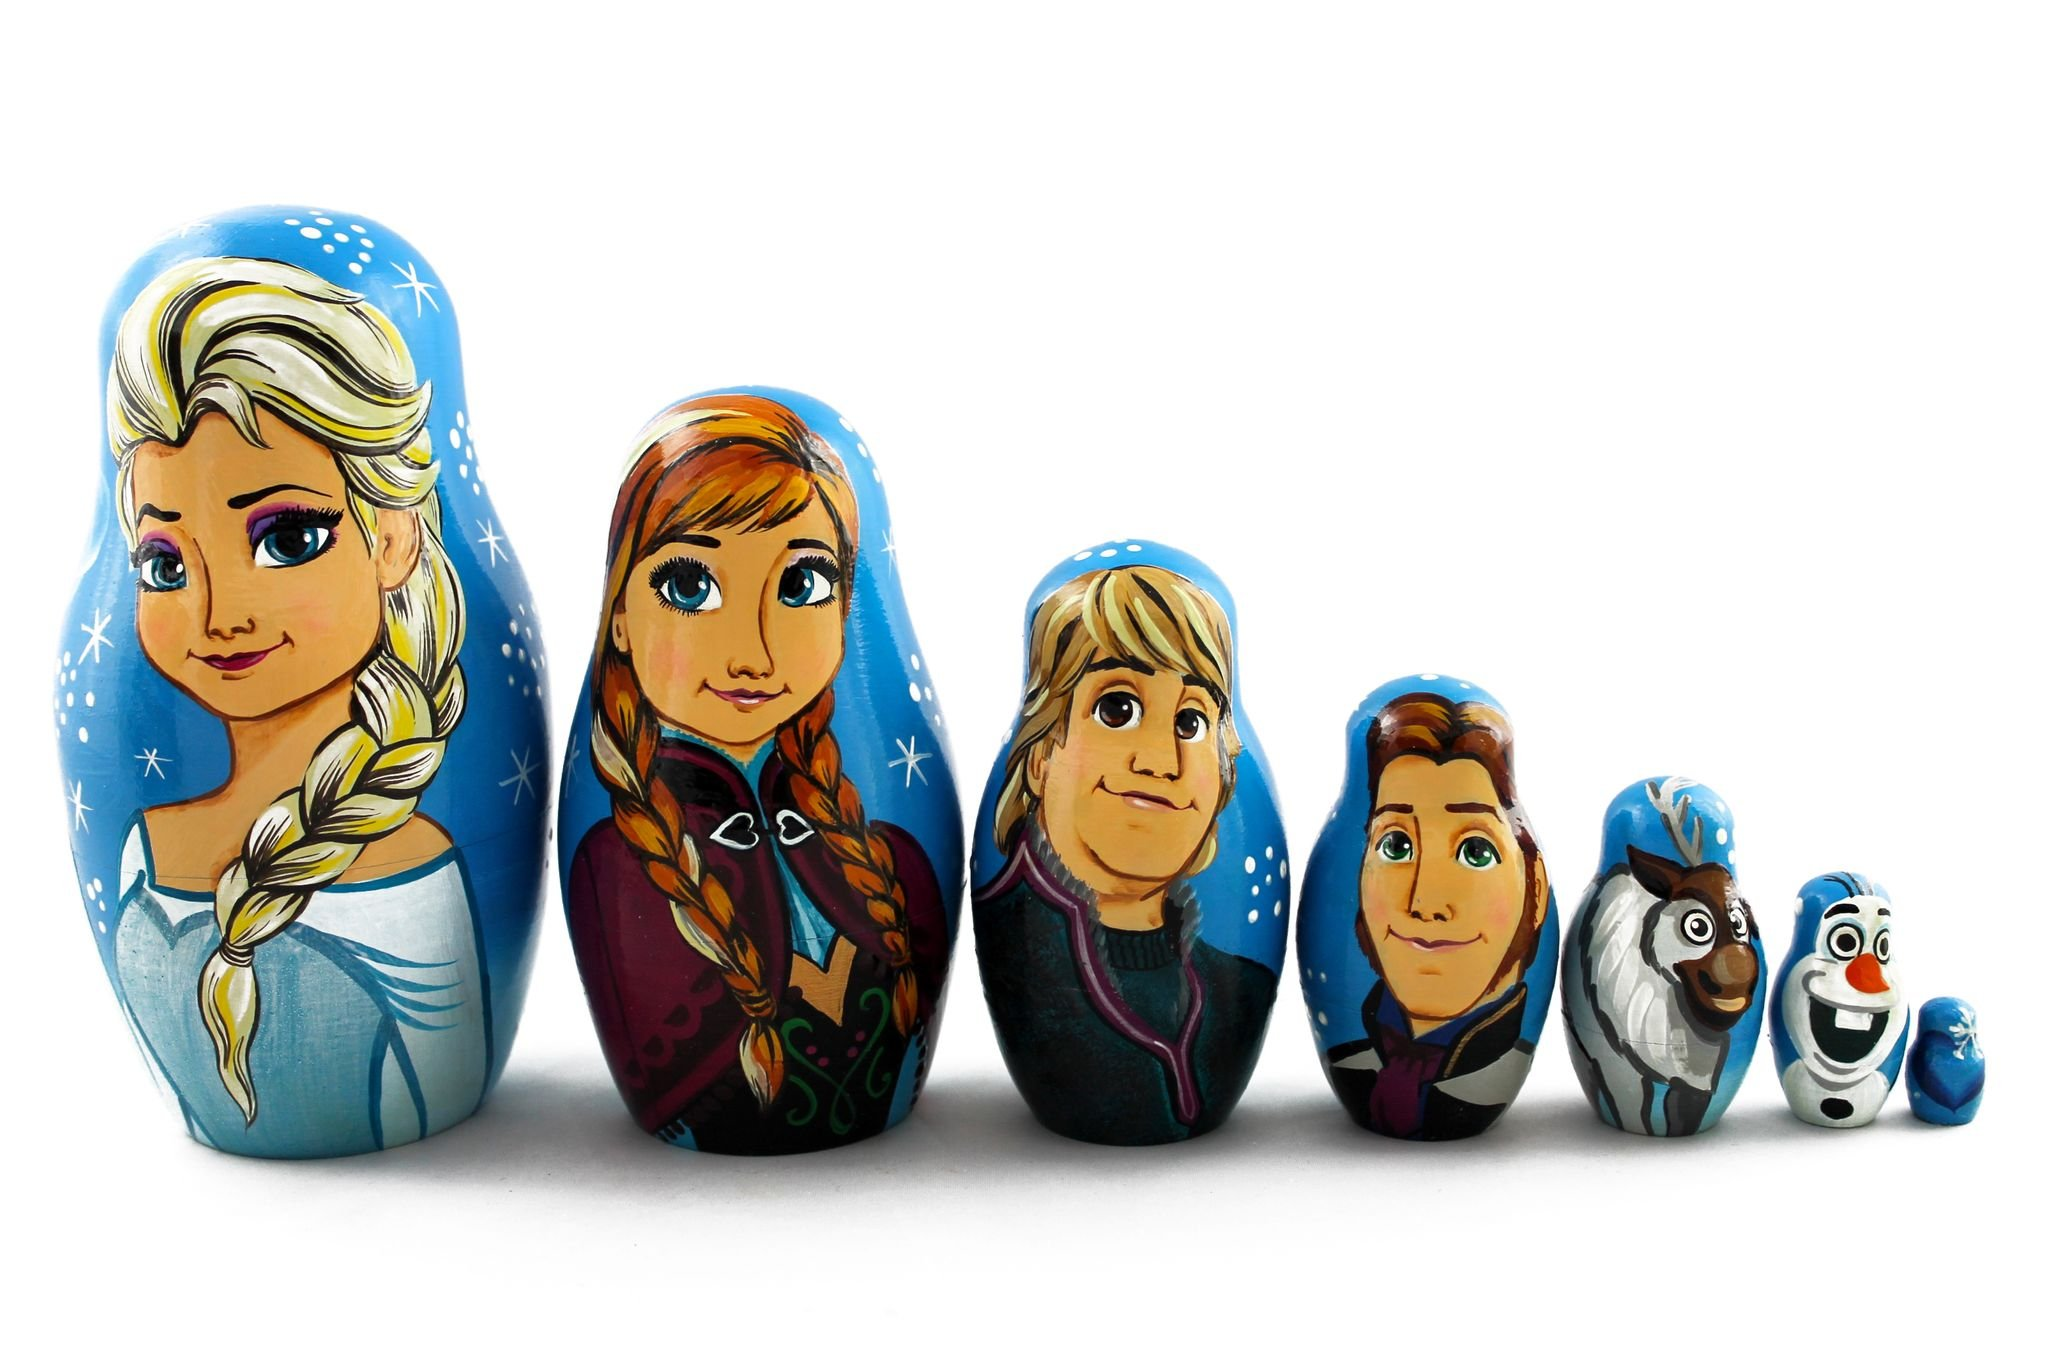 Matryoshka Russian Nesting Doll Babushka Beautiful Cartoon Characters Frozen Elsa Elza 7 Pieces Pcs Wooden Hand Painted Souvenir Craft Gift by MATRYOSHKA&HANDICRAFT by MATRYOSHKA&HANDICRAFT